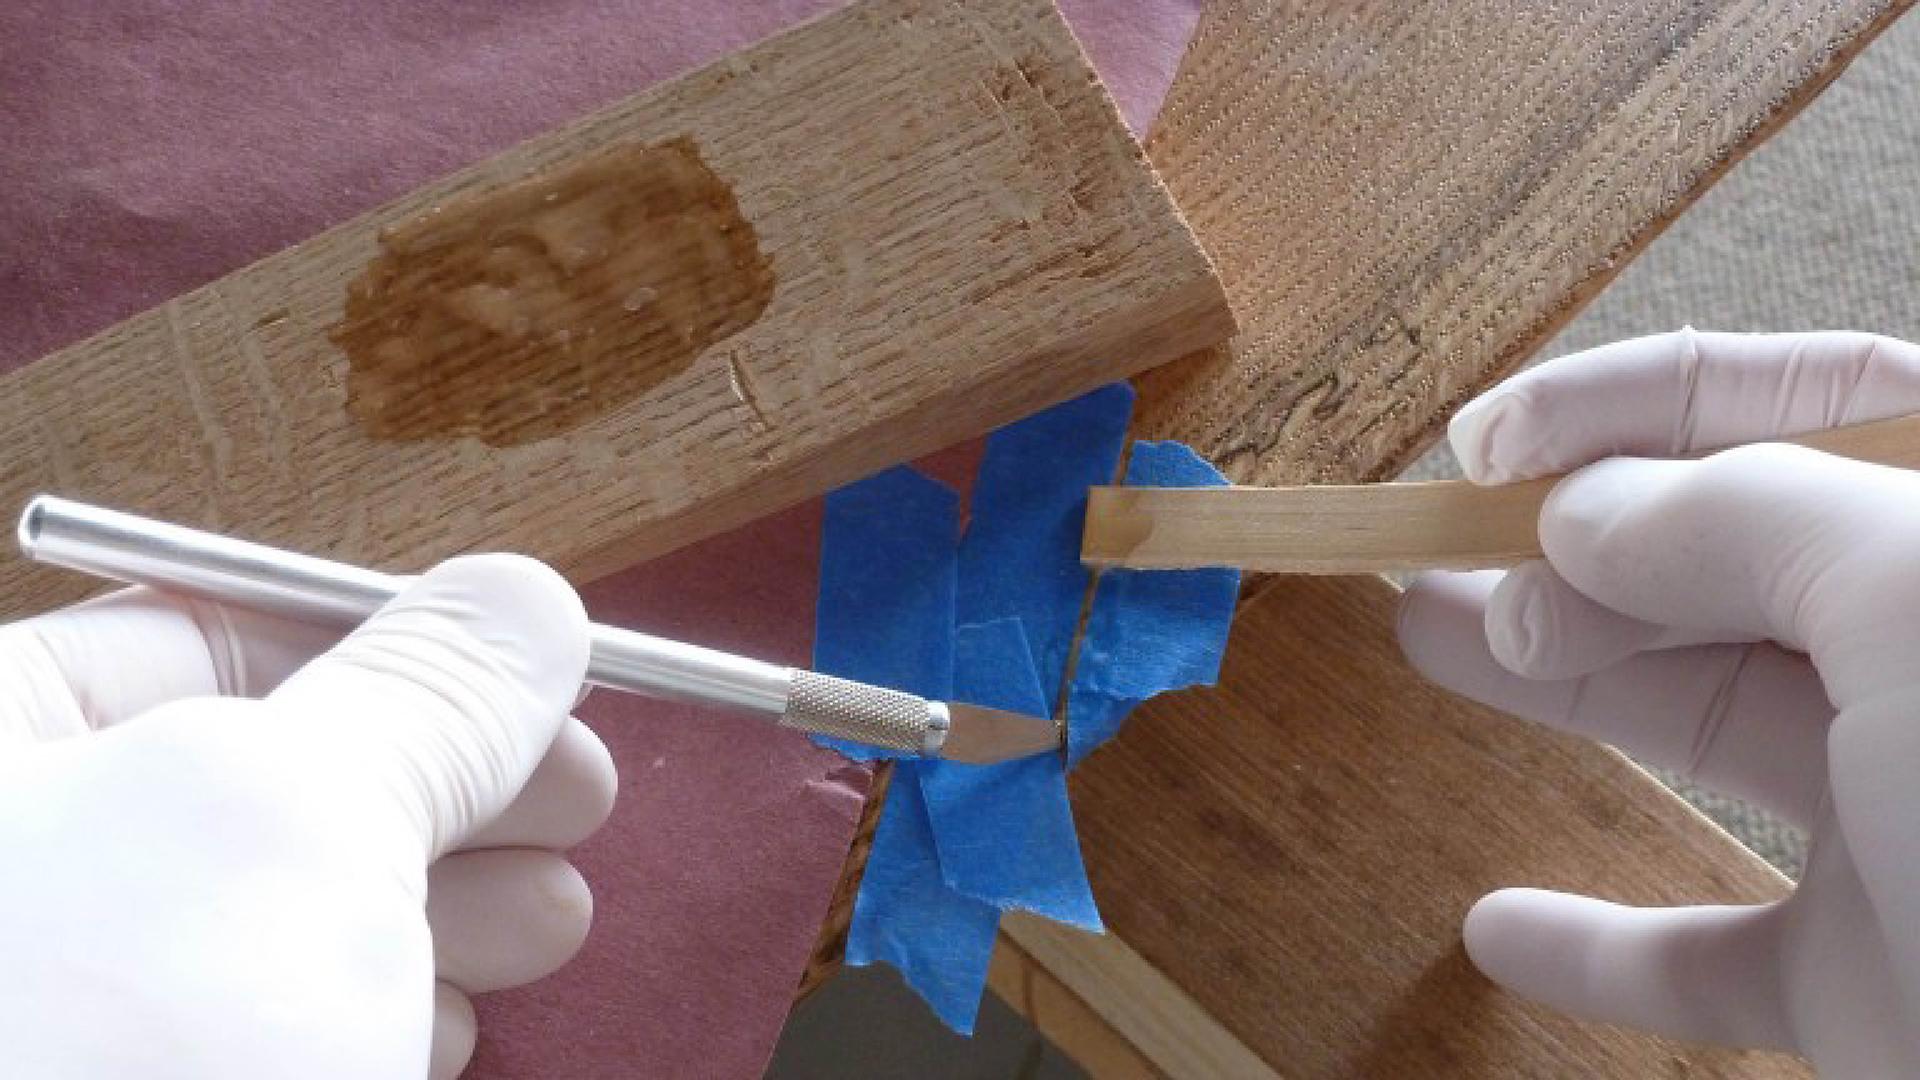 Woodworking Restoration Guide - Table Top Fracture Repair